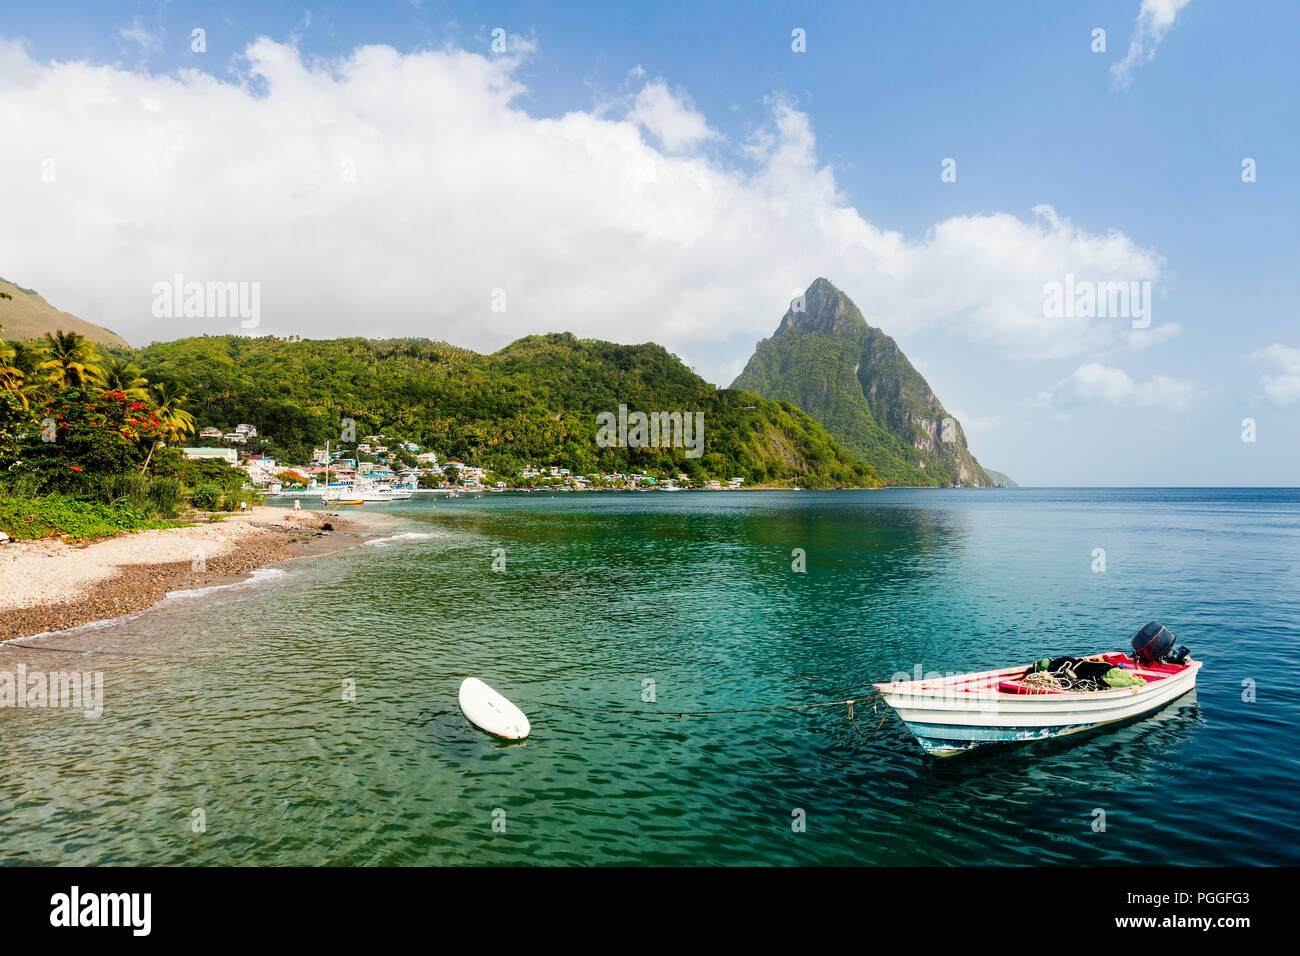 Idyllic white sand tropical beach with view to Piton mountains in Saint Lucia Caribbean Stock Photo